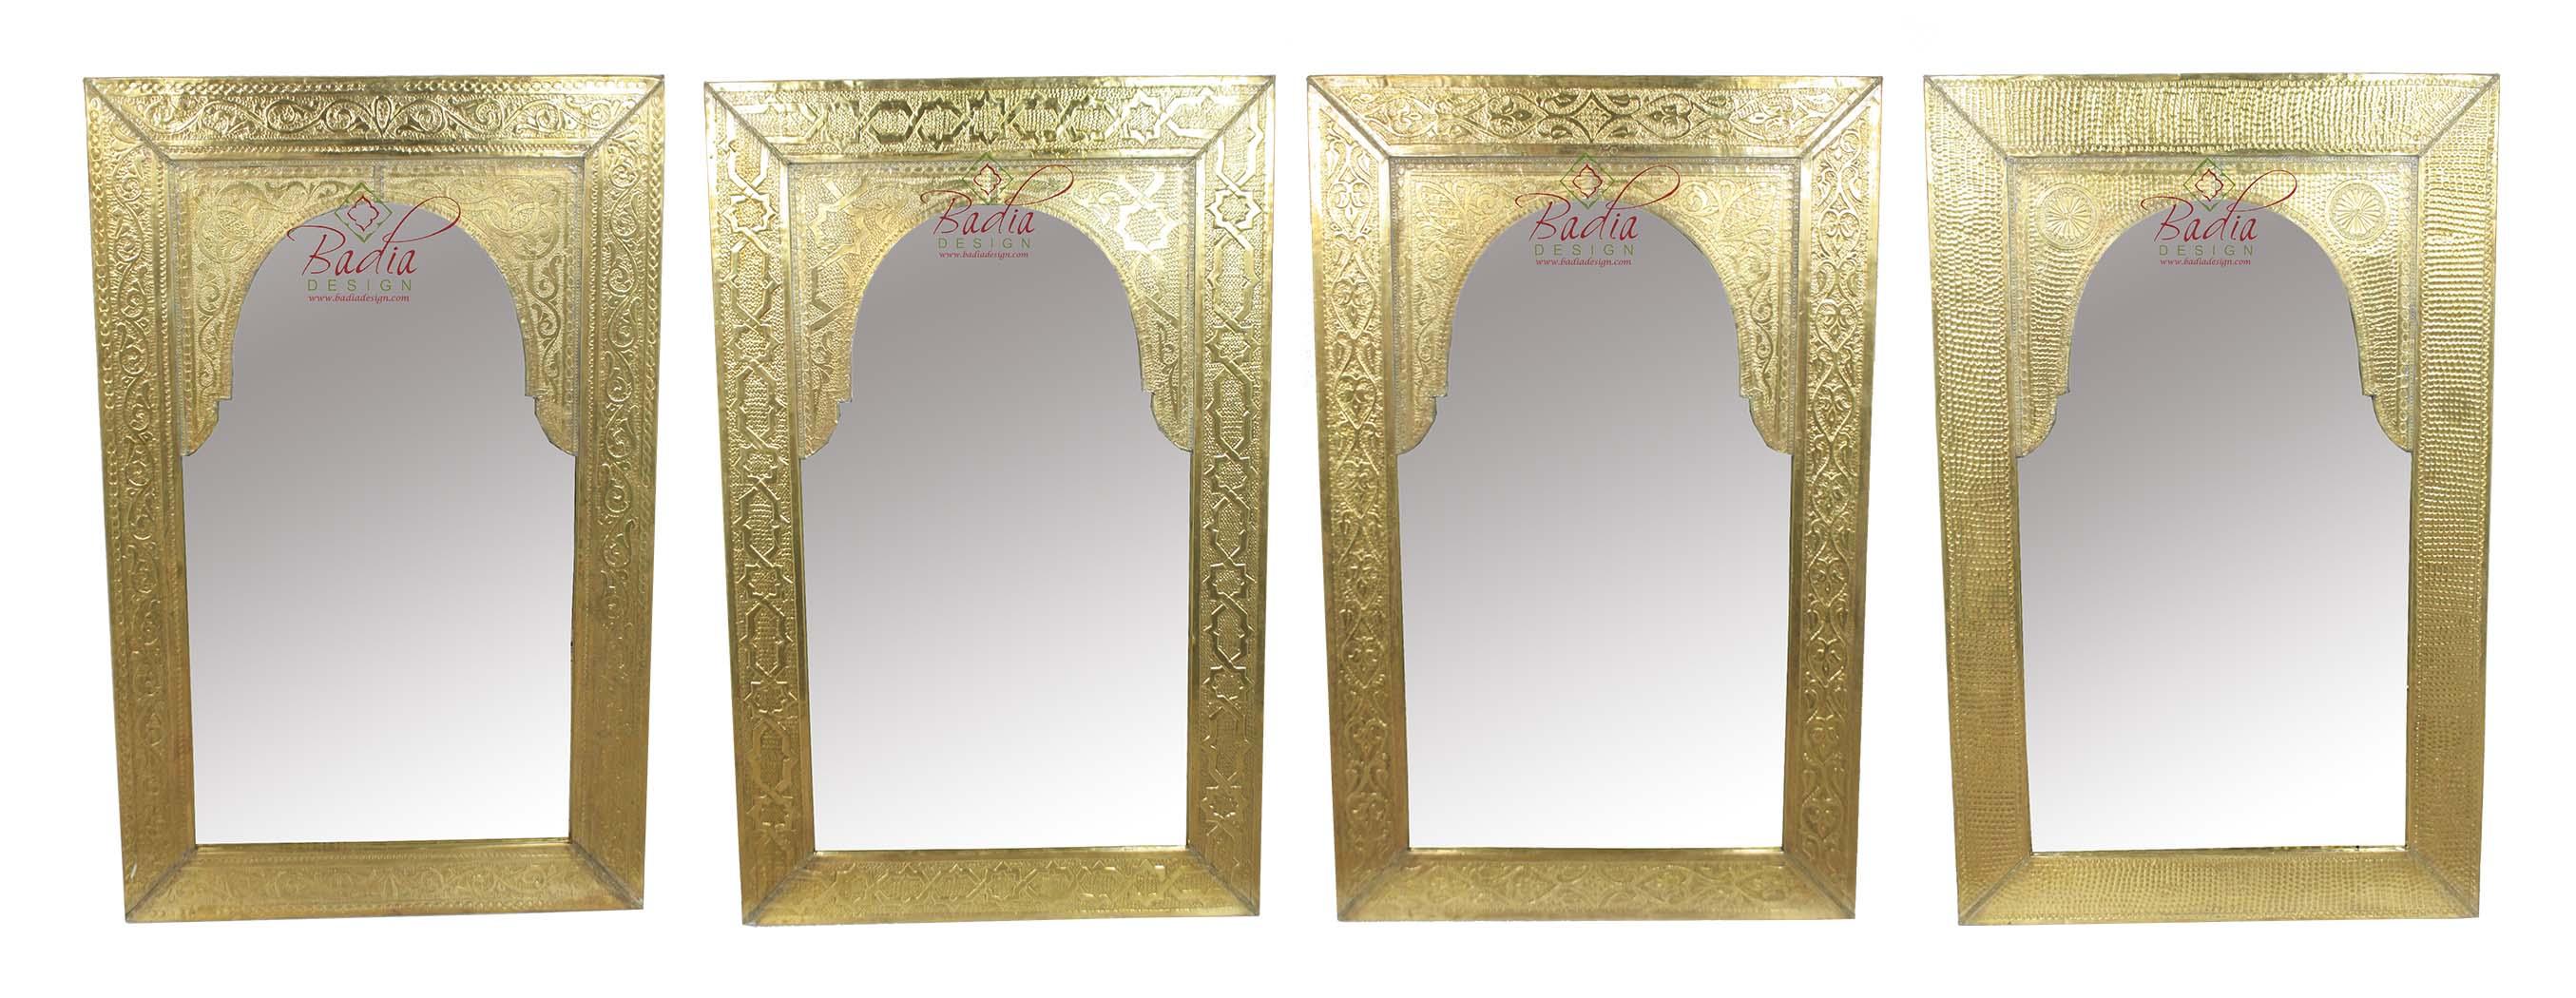 moroccan-brass-frame-mirror-m-em011.jpg